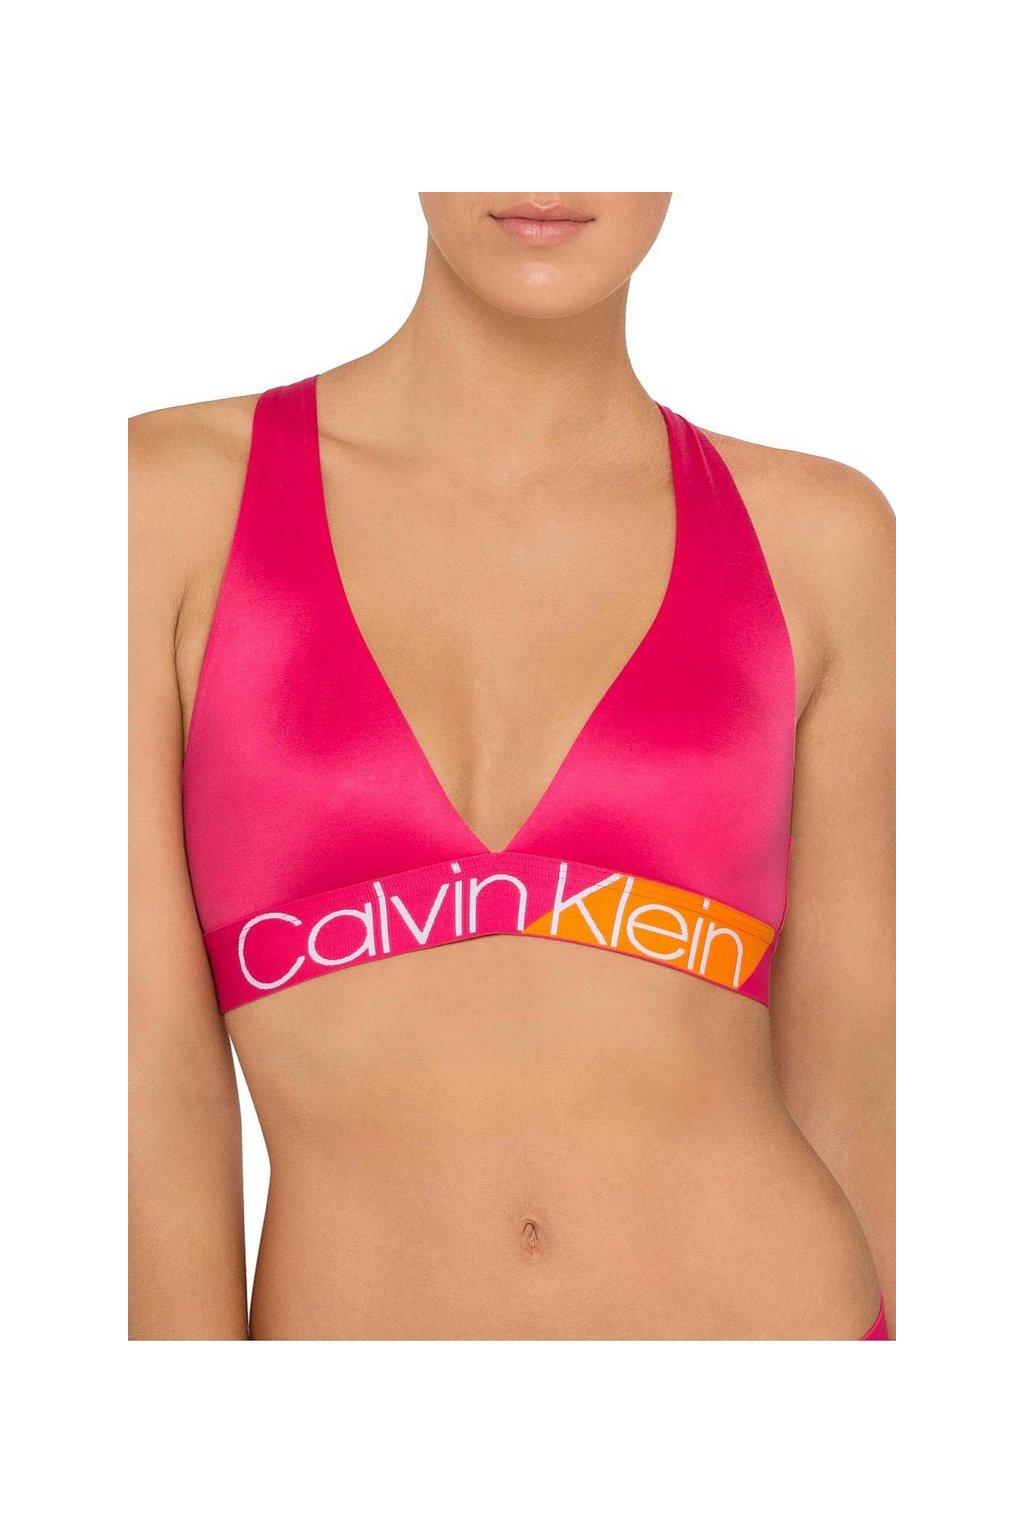 Calvin Klein Bold Accents Unlined Braletka - nora/ bell orange